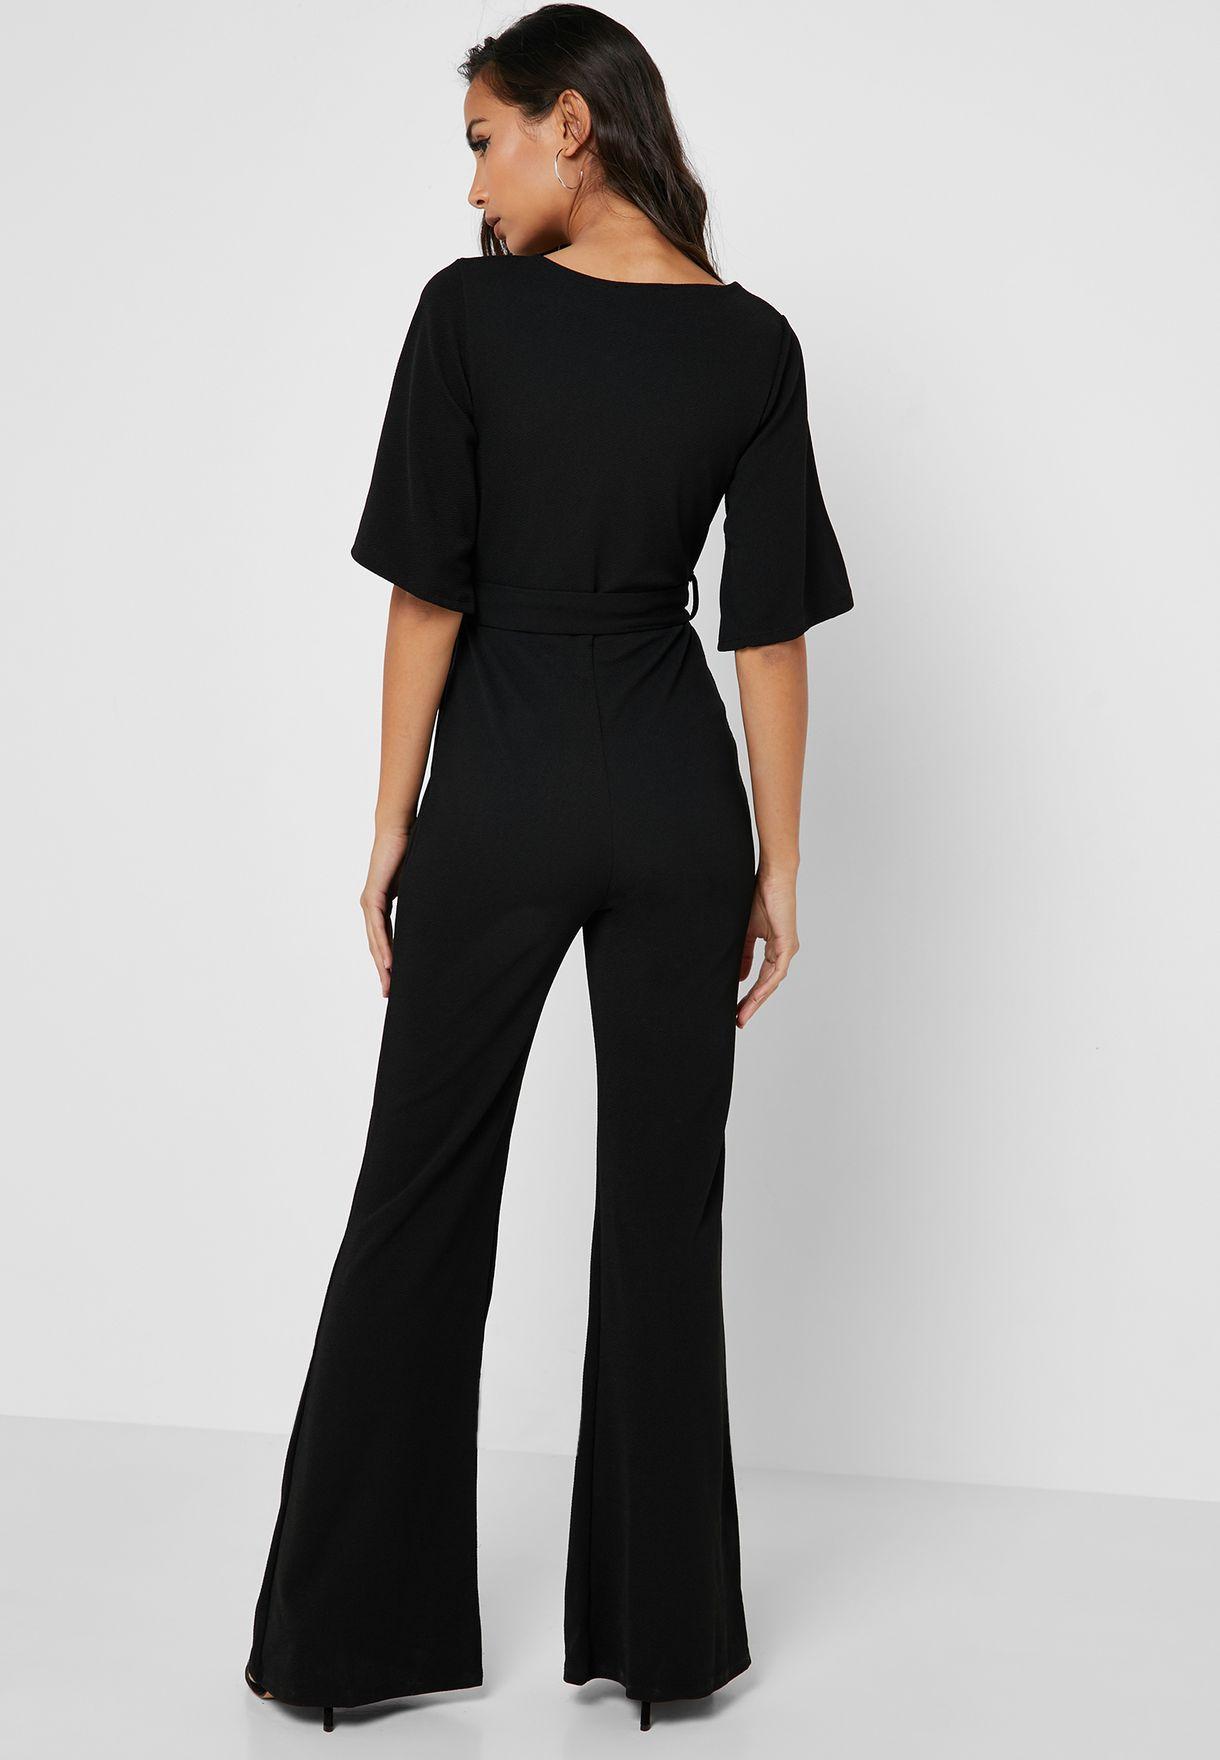 dc7640bb45b3 Shop Missguided Petite black Kimono Sleeve Plunge Jumpsuit Z9216360 ...